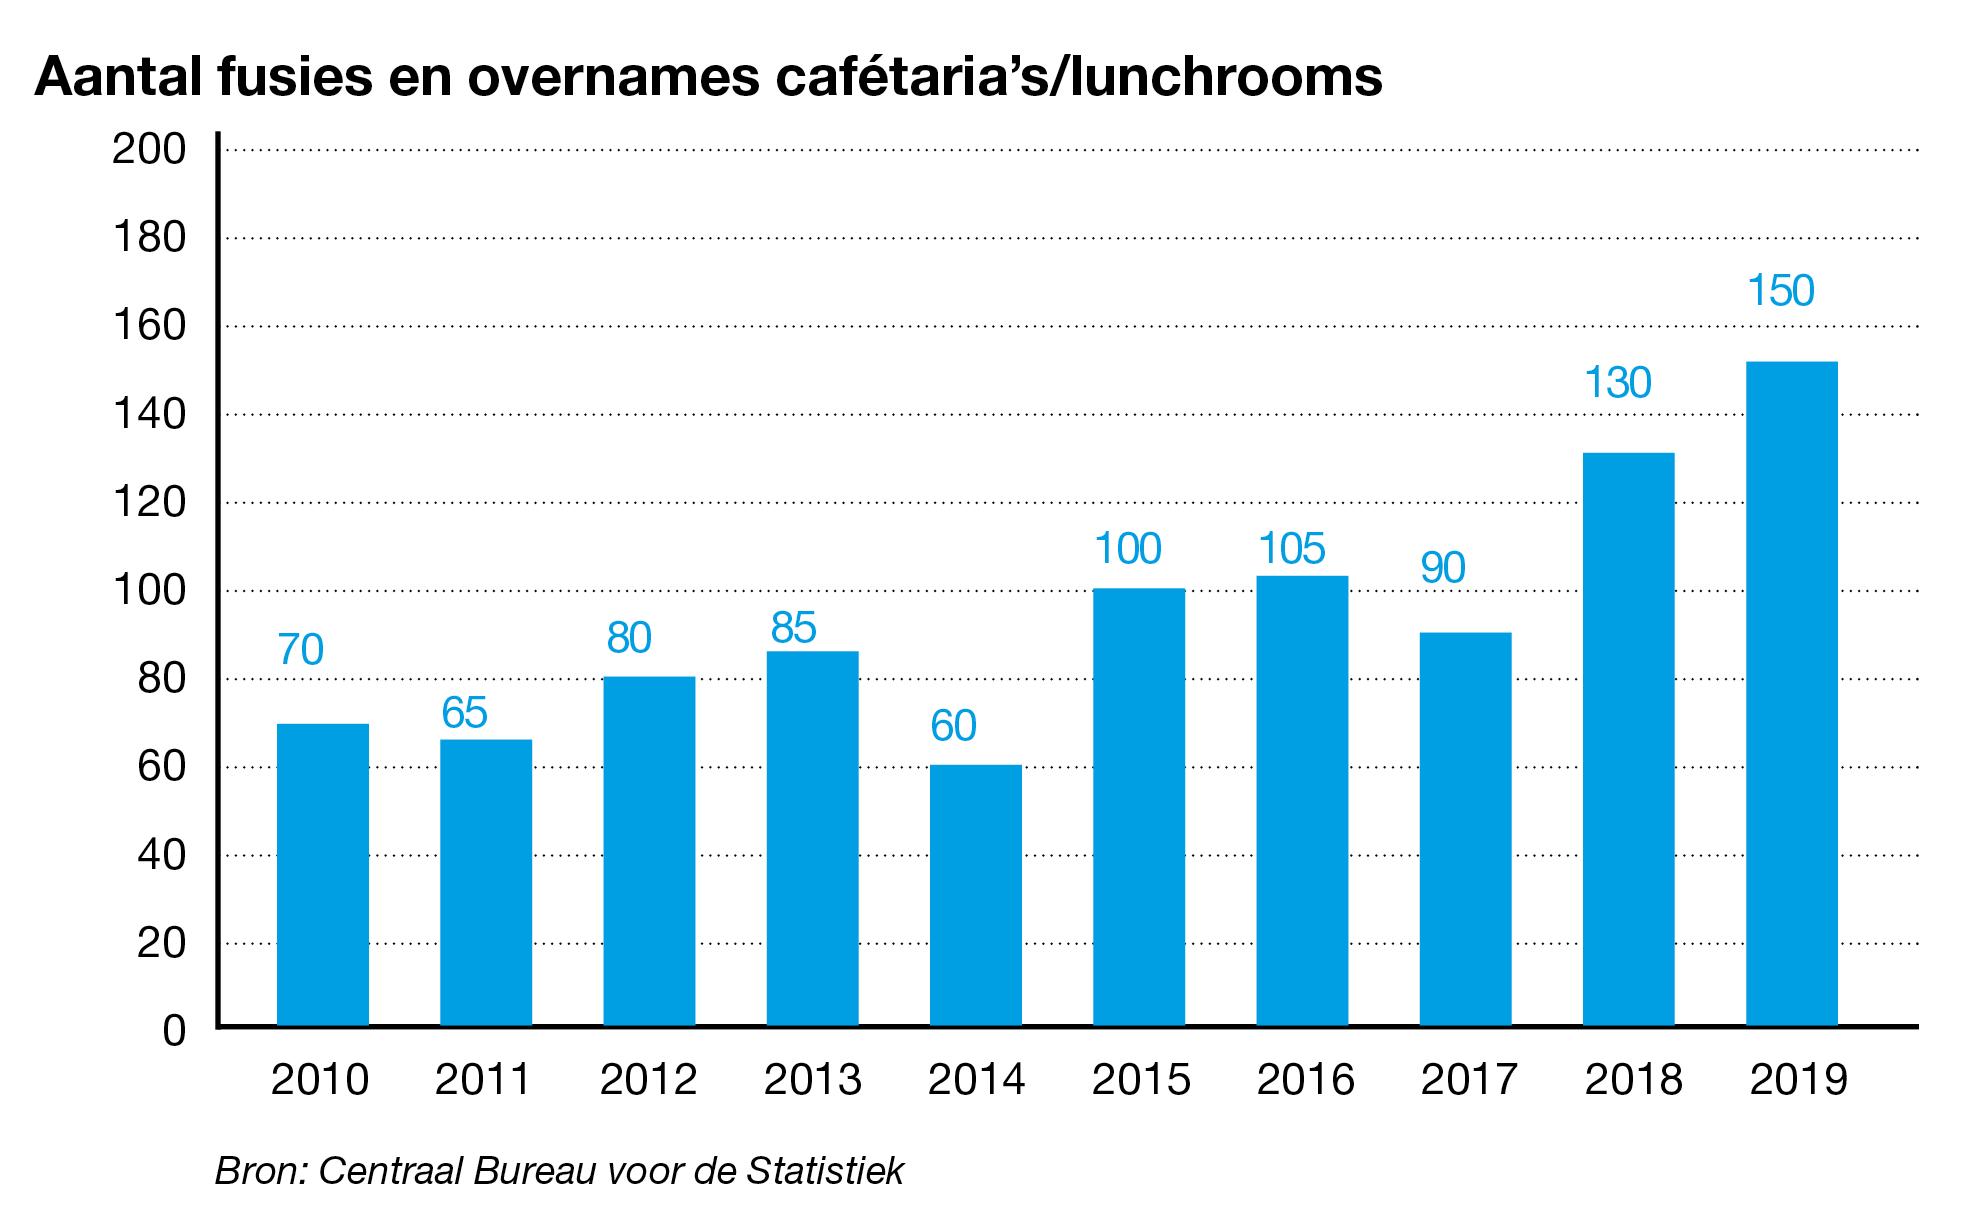 Aantal overnames cafetaria's/lunchrooms